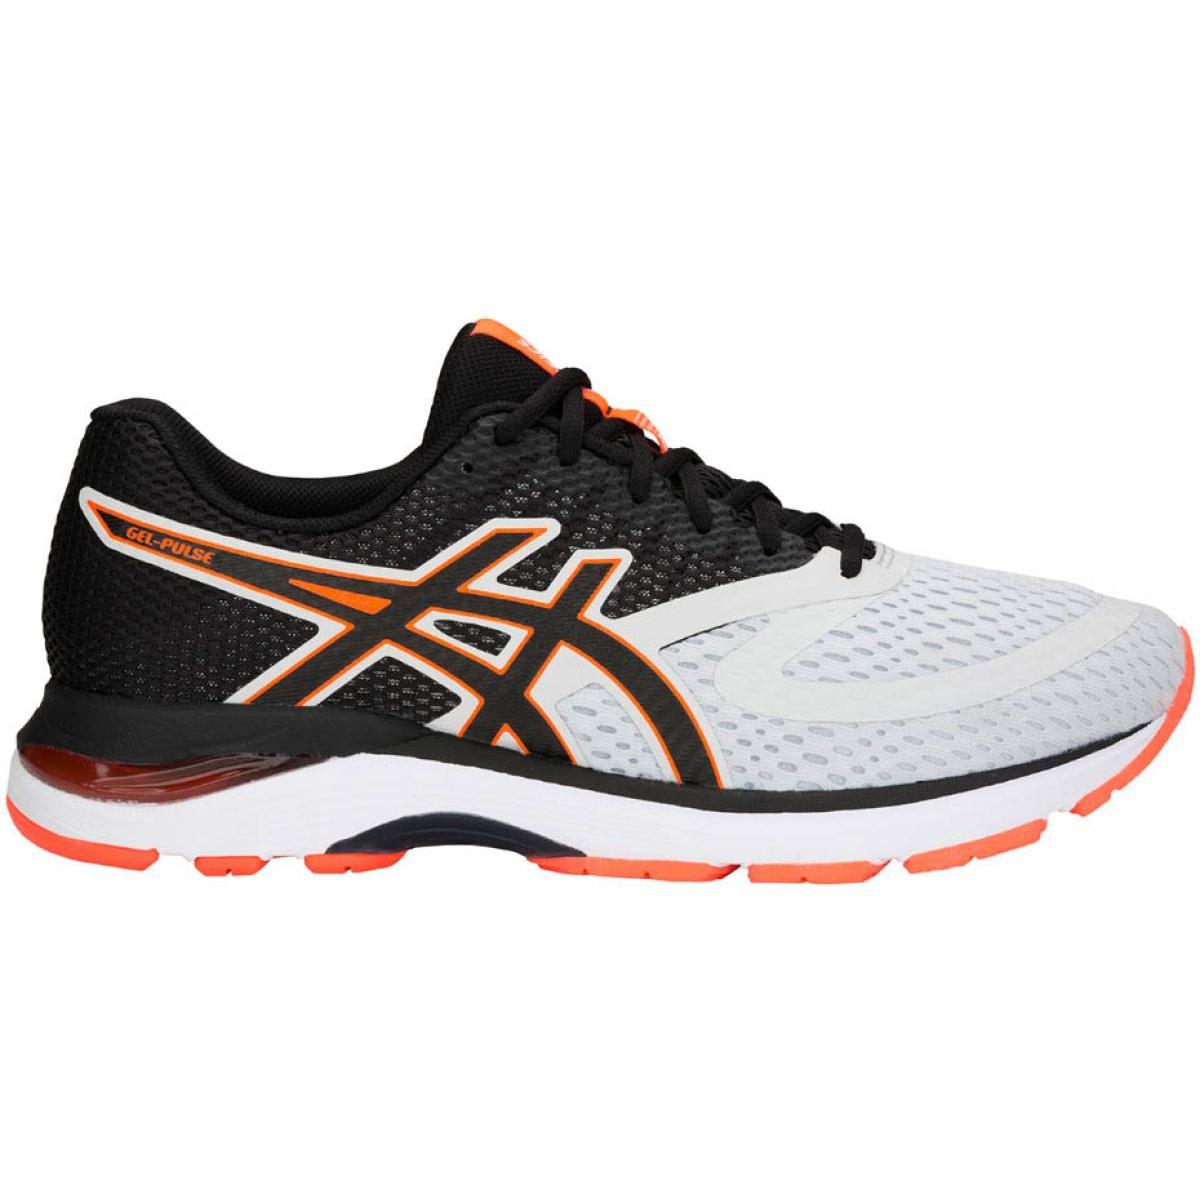 Running shoes Asics Gel Pulse 10 M 1011A007-020 white black orange